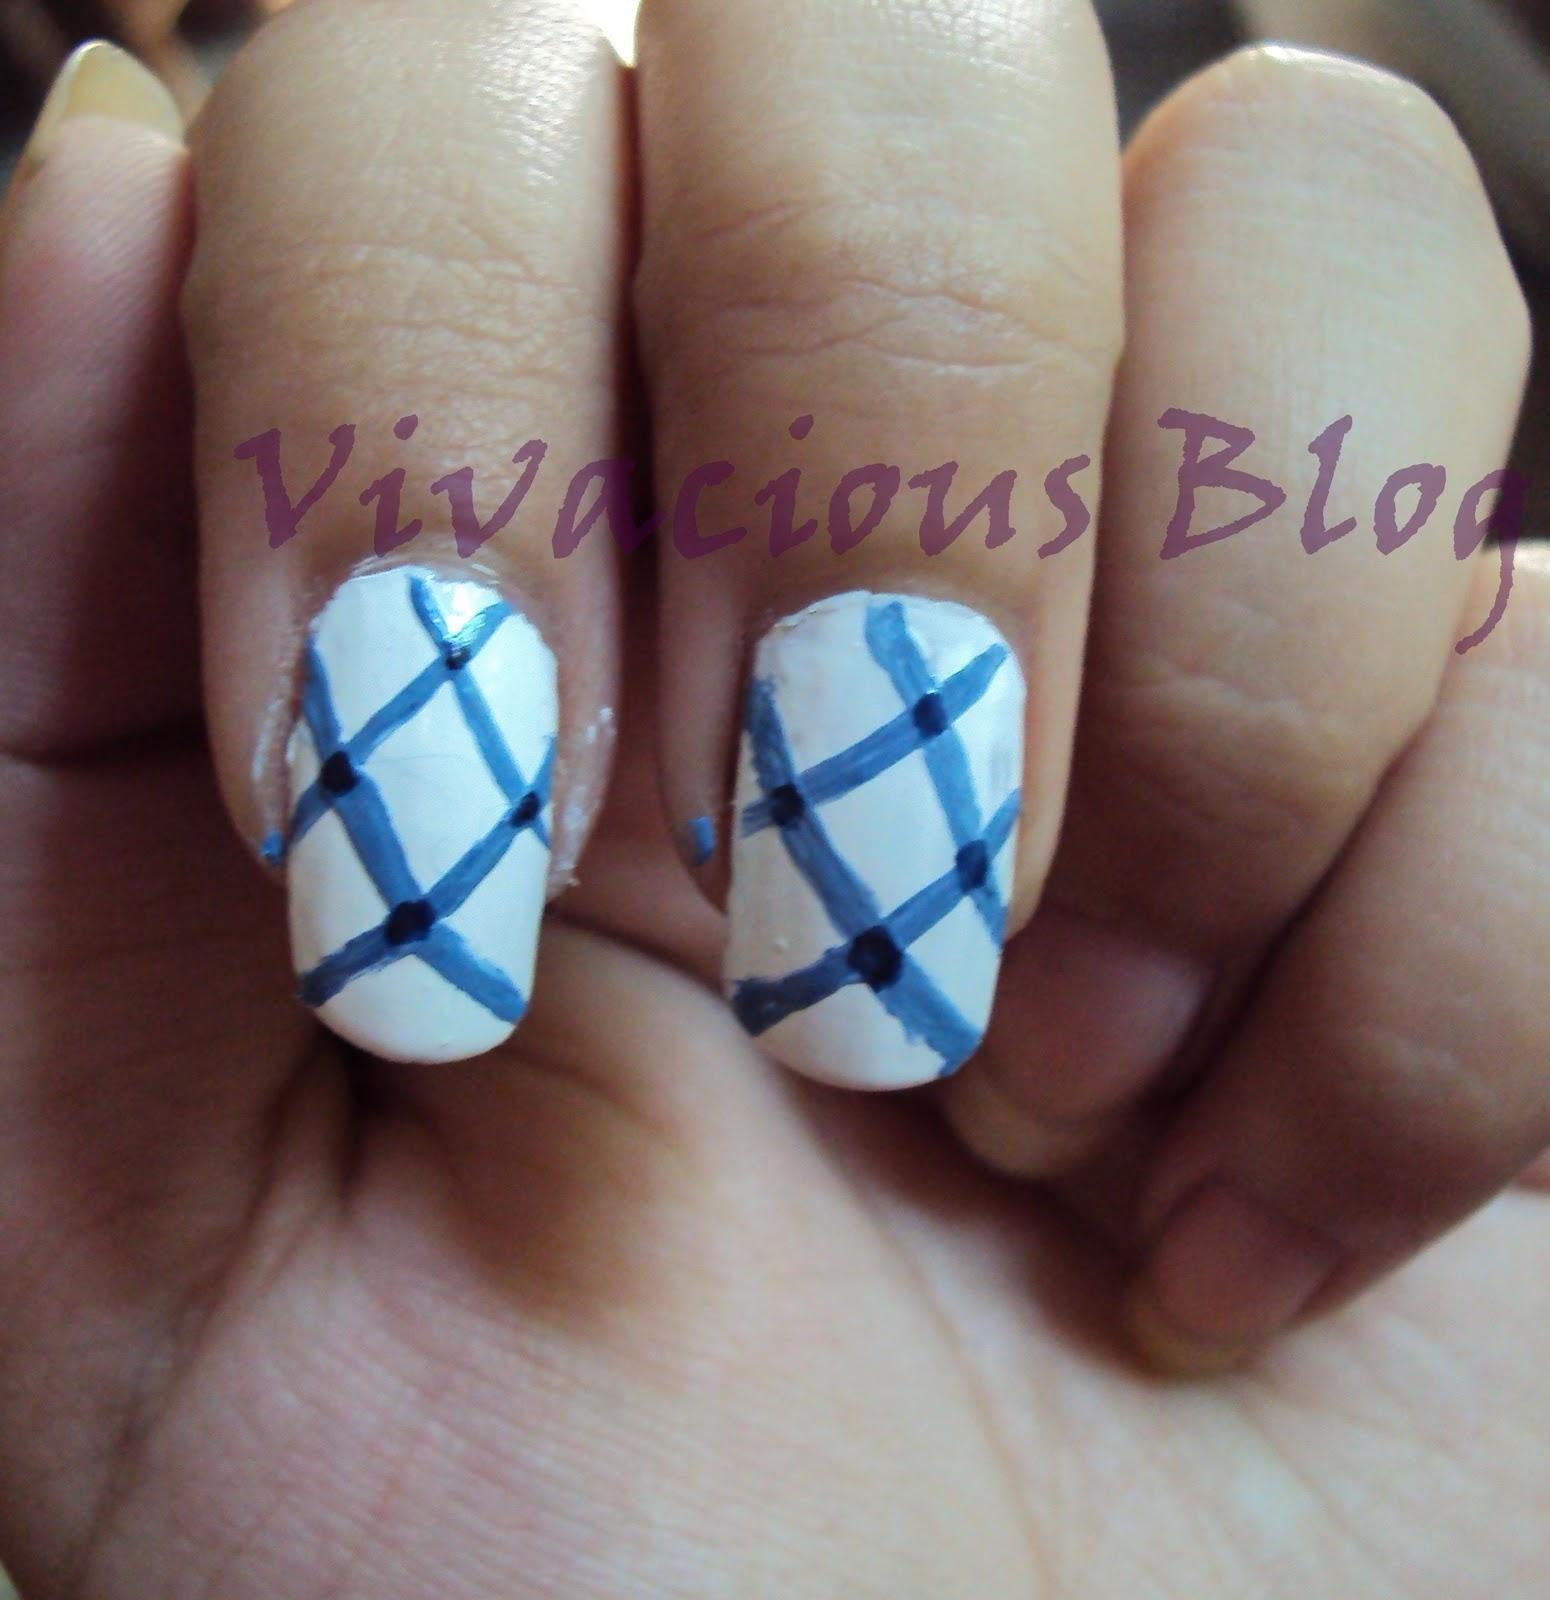 Colorful Criss Cross Nail Art